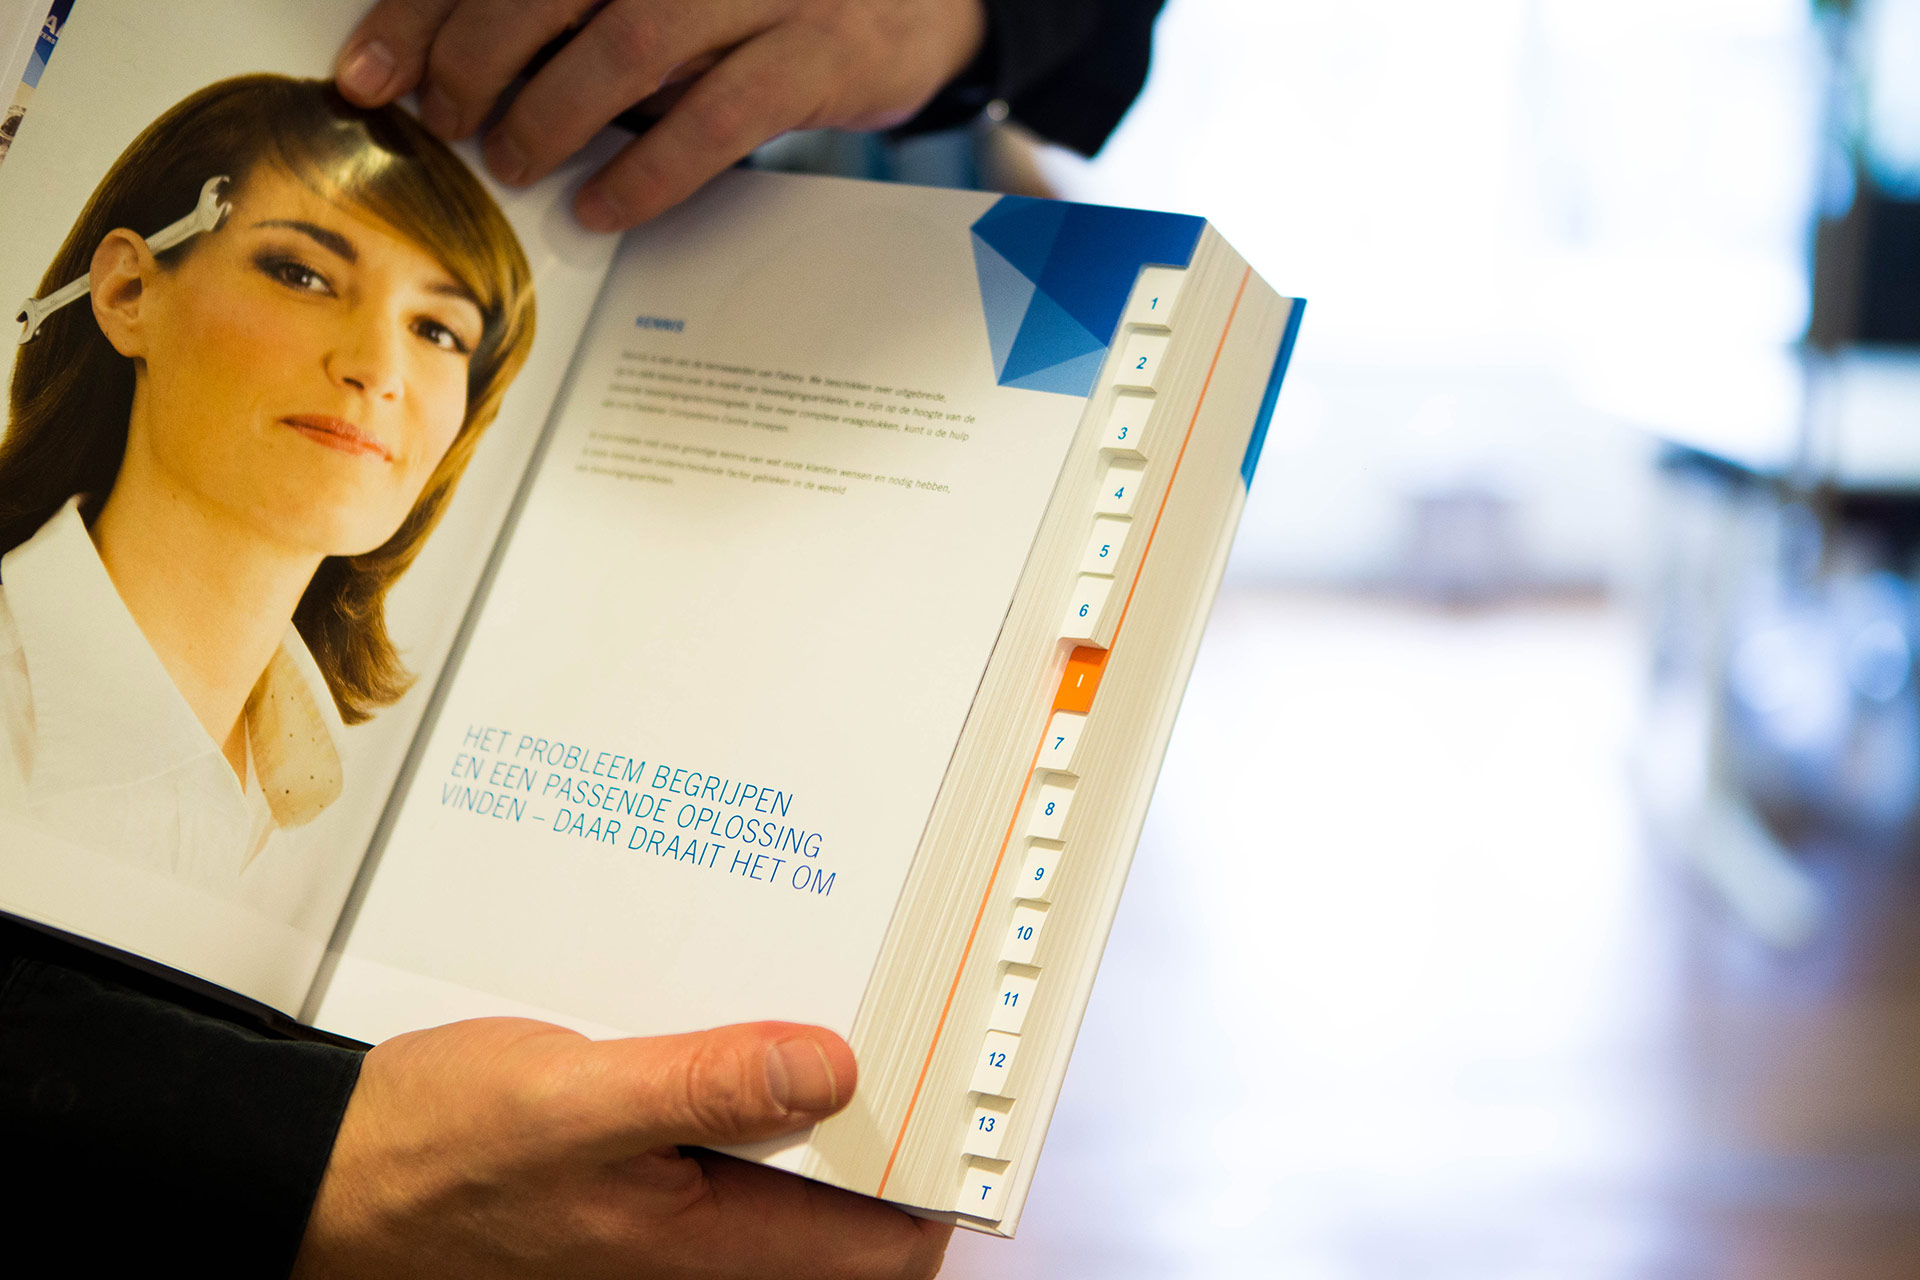 PerfectBook - Catalogus met tabs